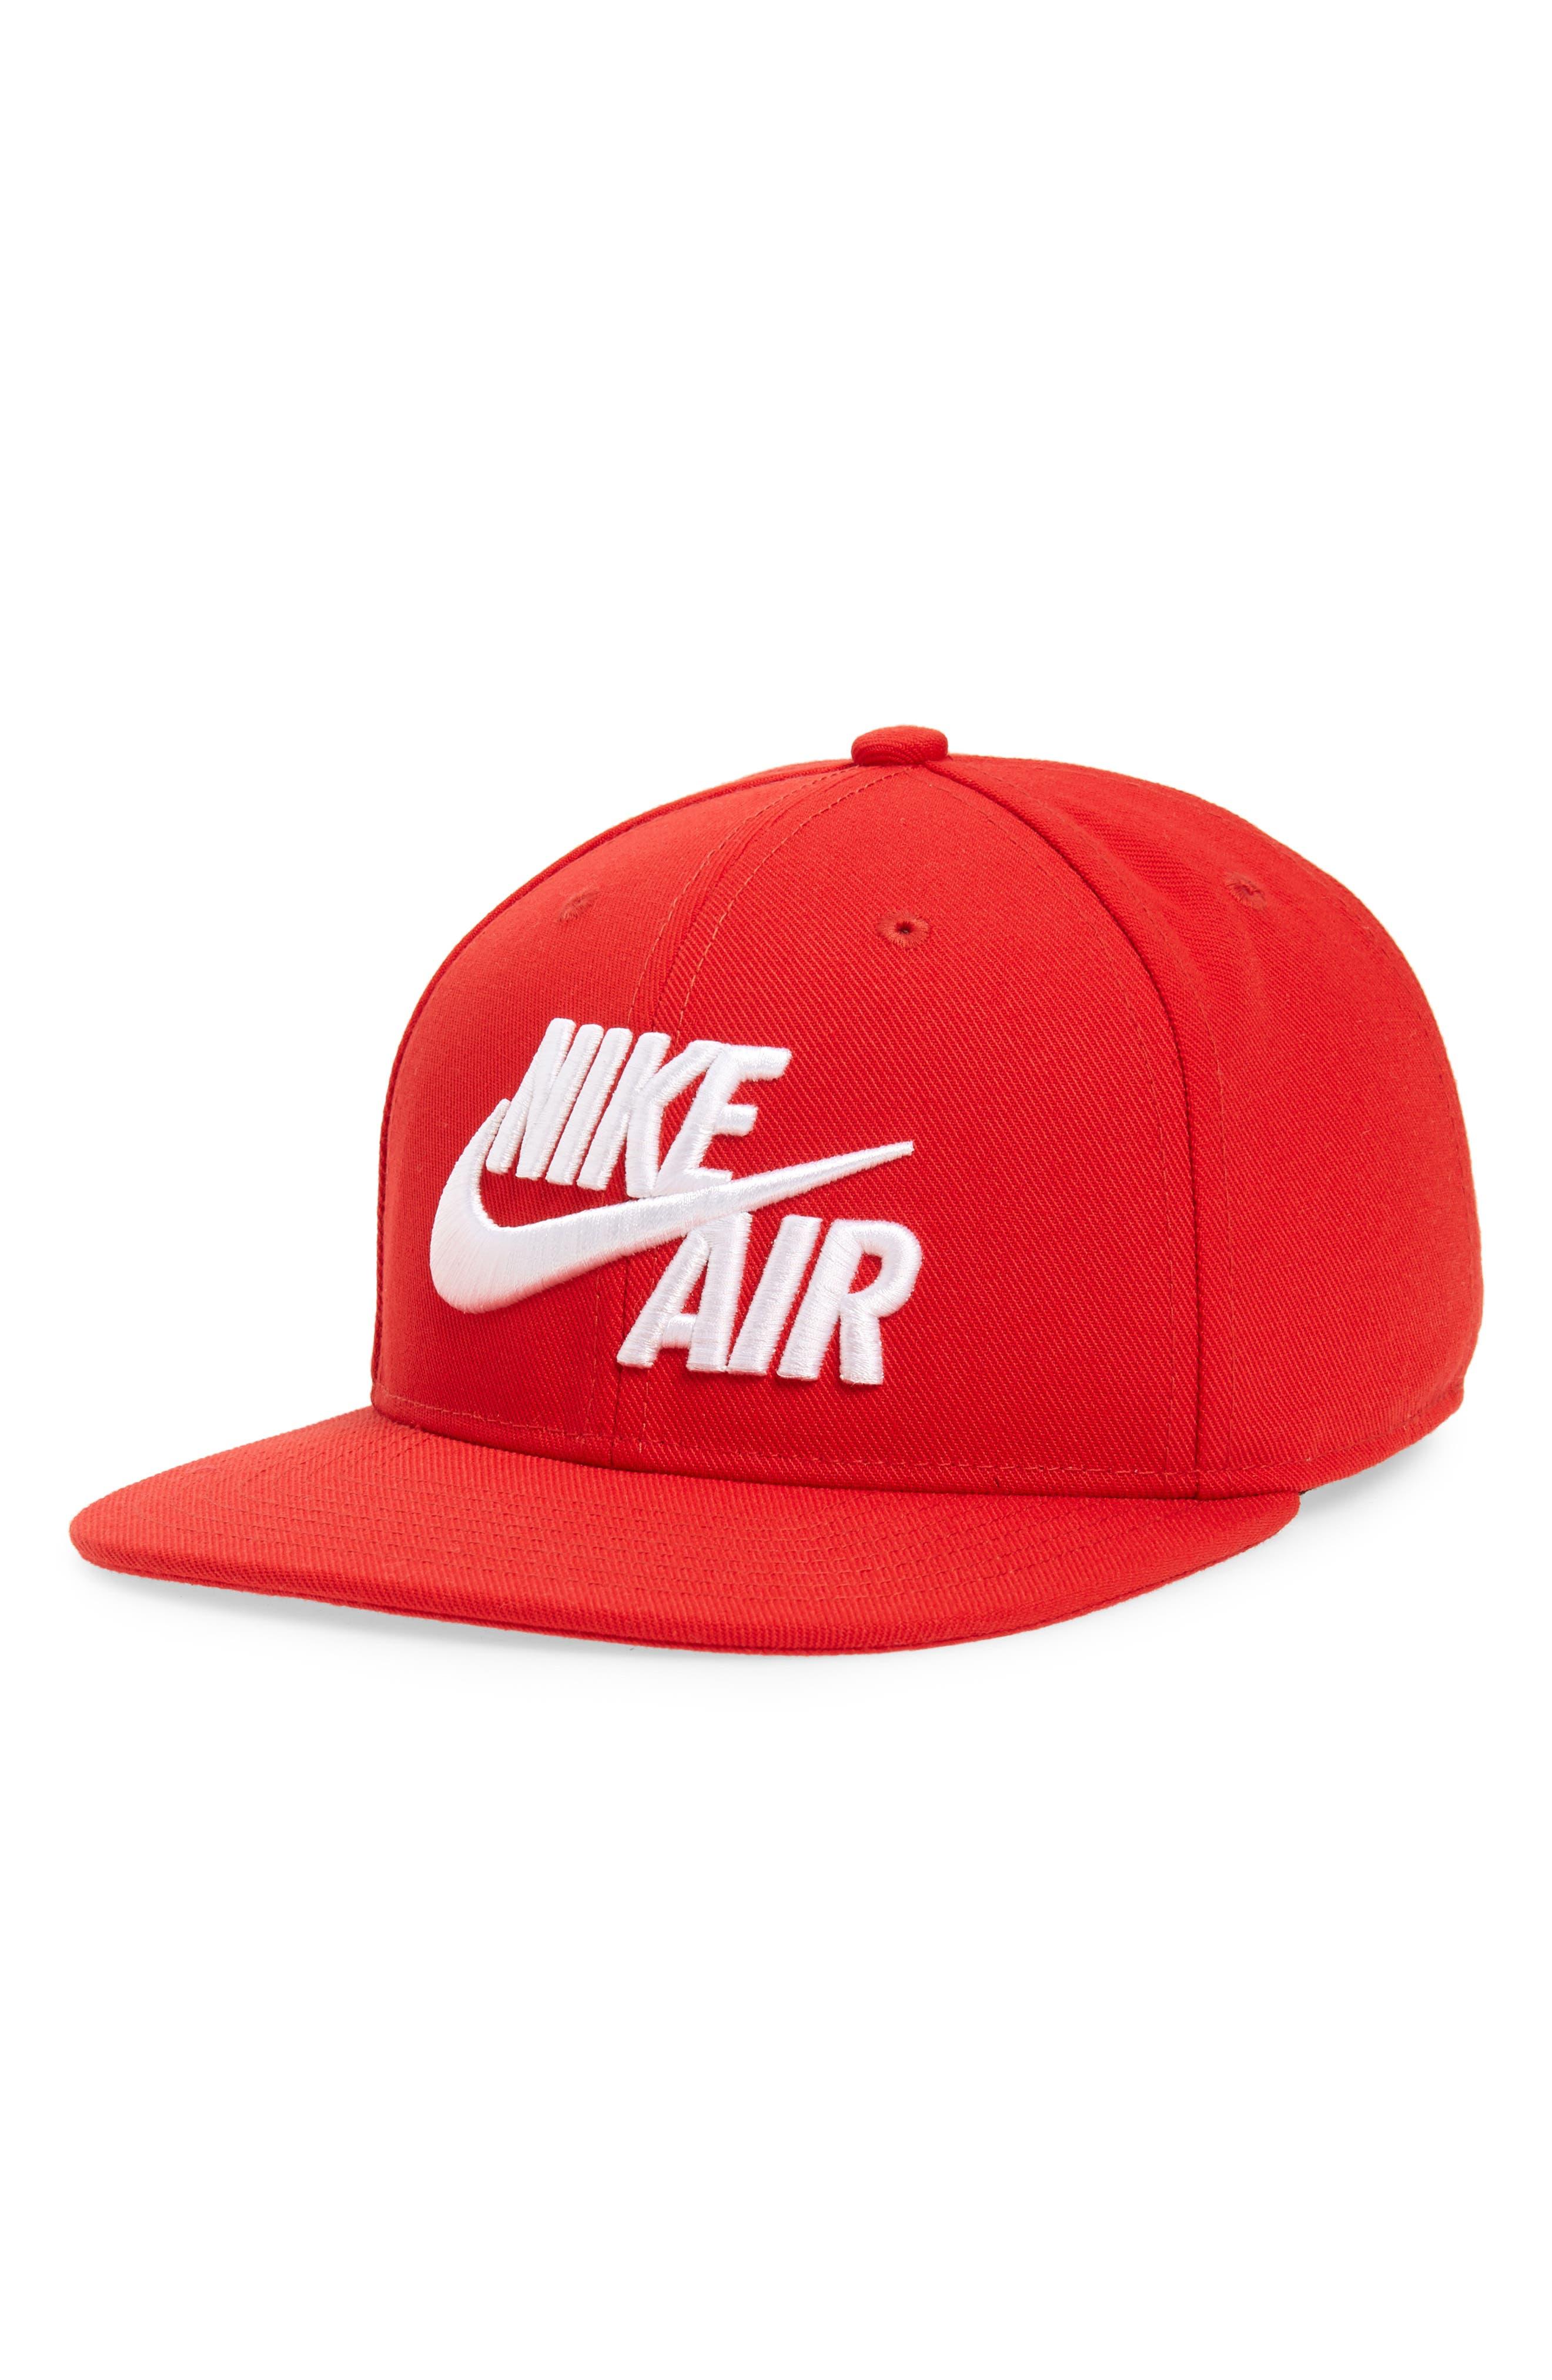 NIKE, Air Pro Snapback Baseball Cap, Main thumbnail 1, color, UNIVERSITY RED